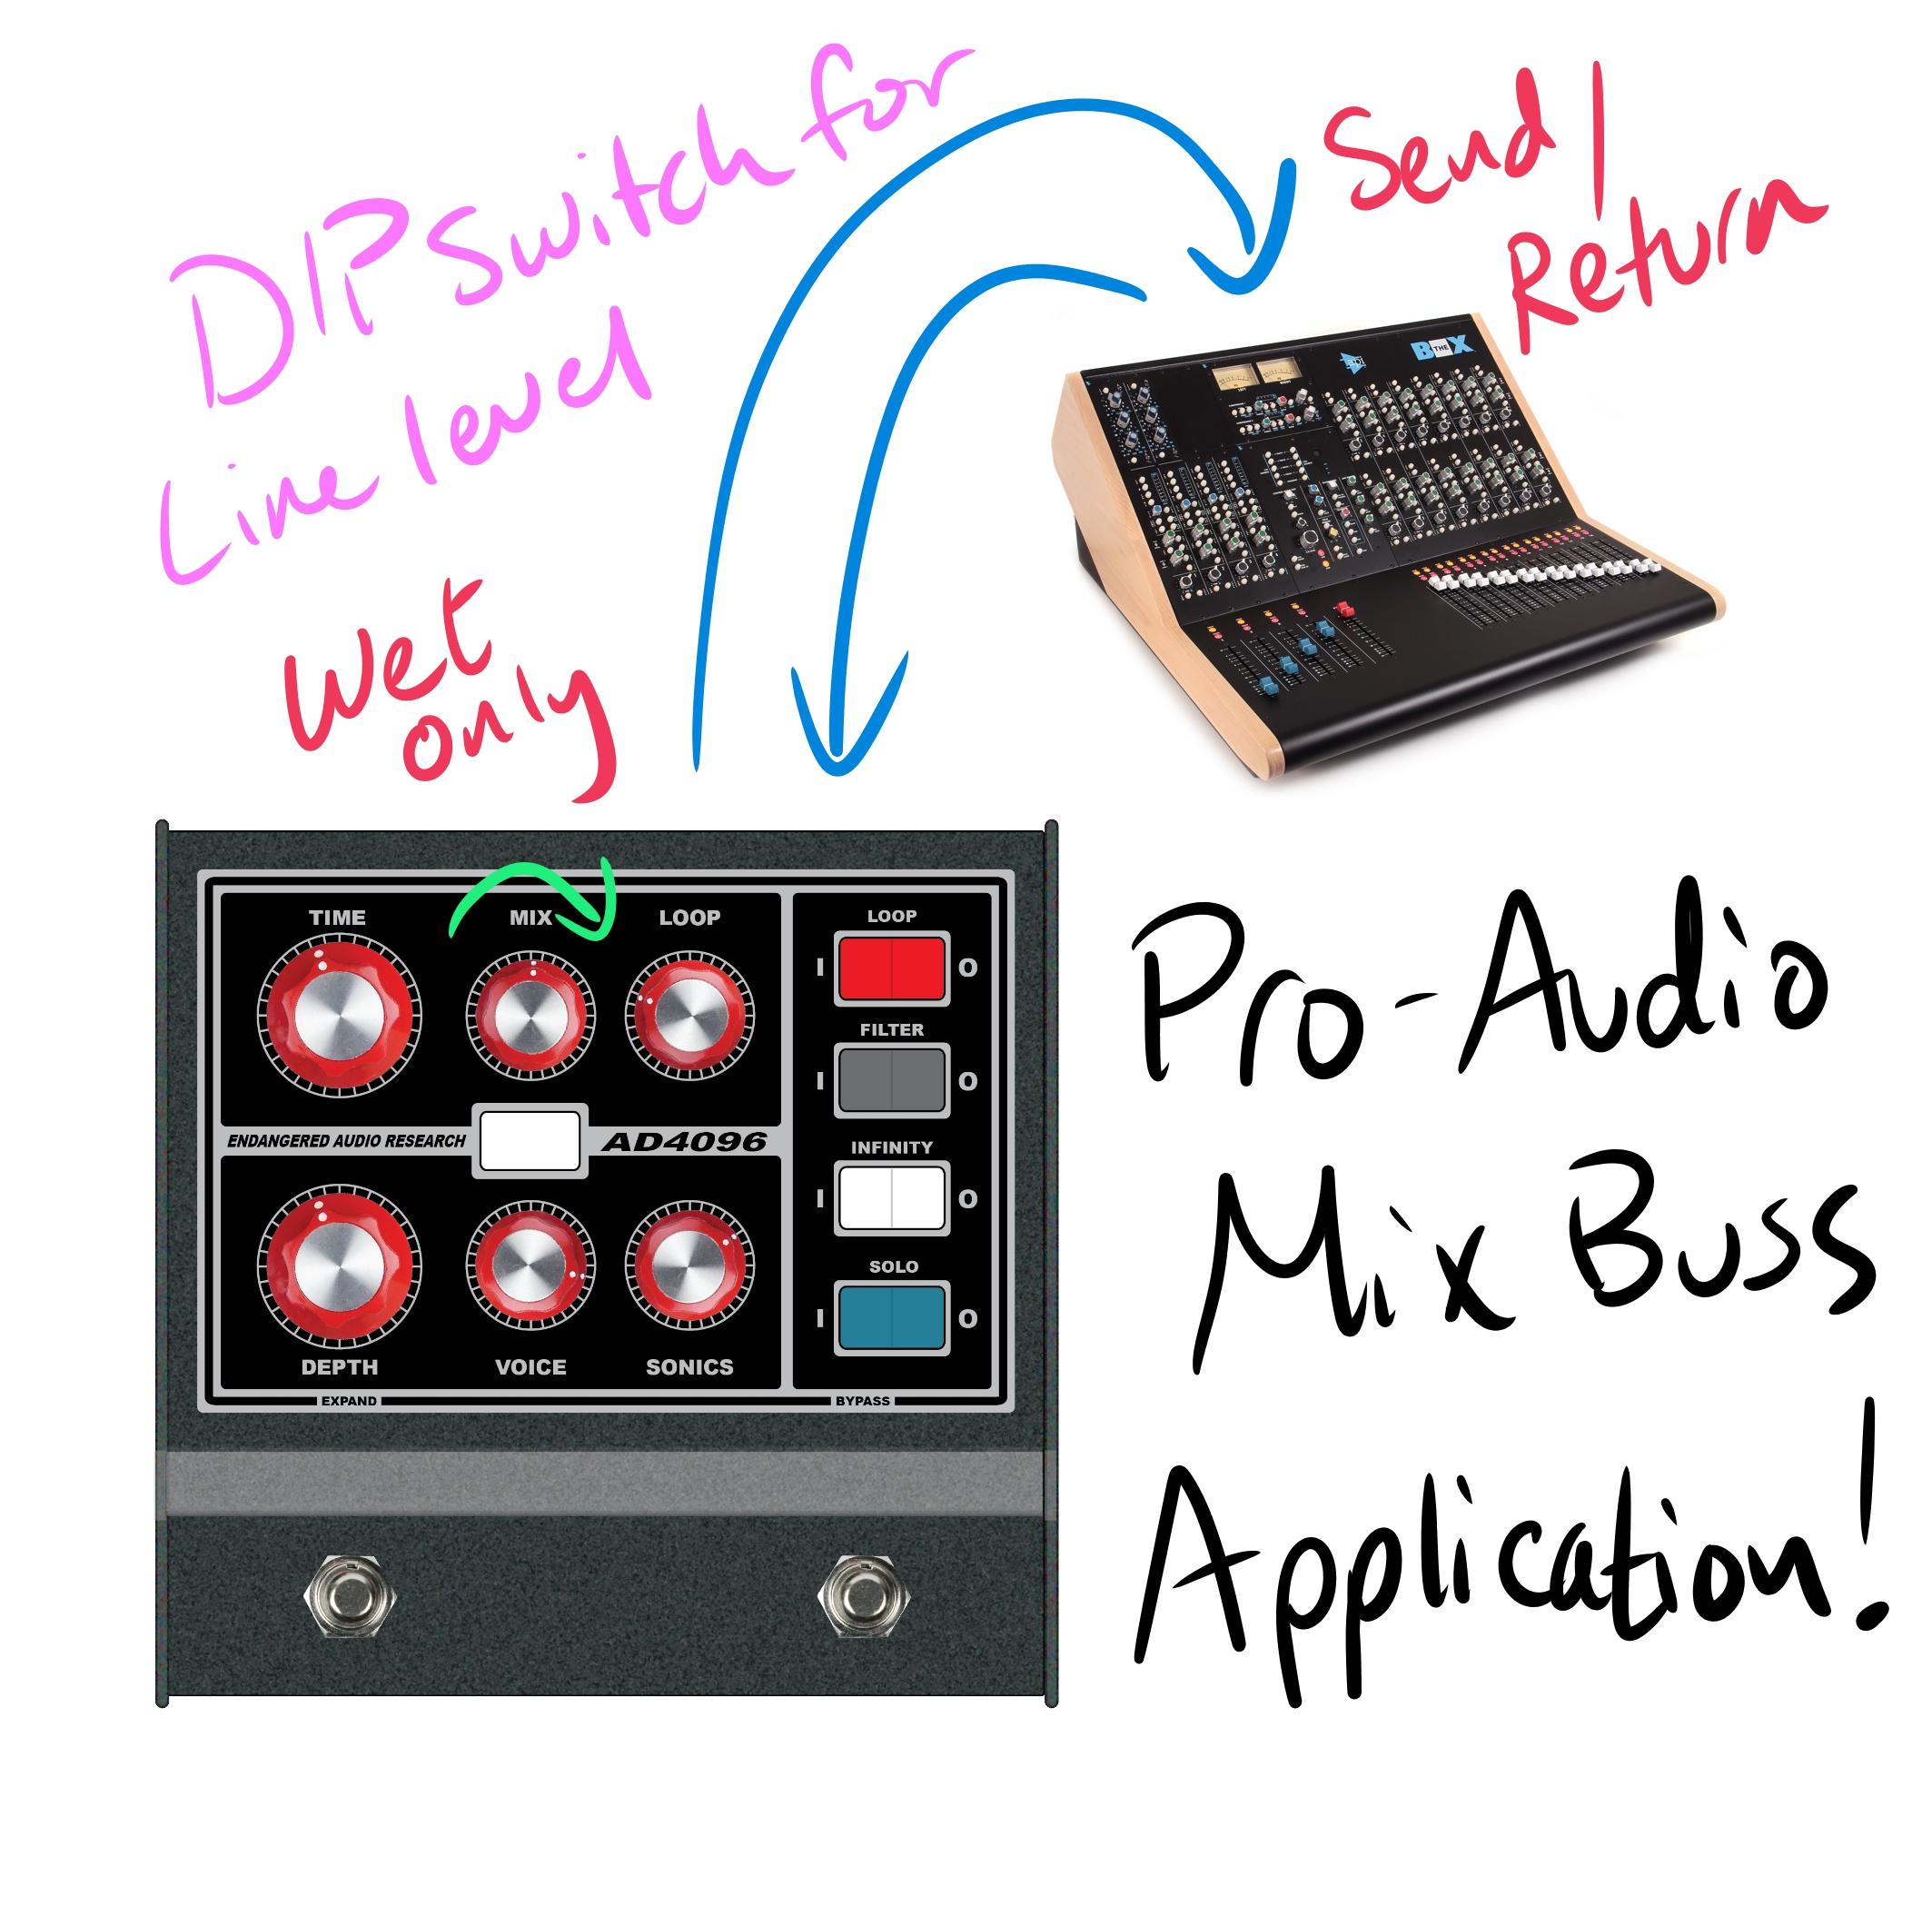 pro audio.jpg